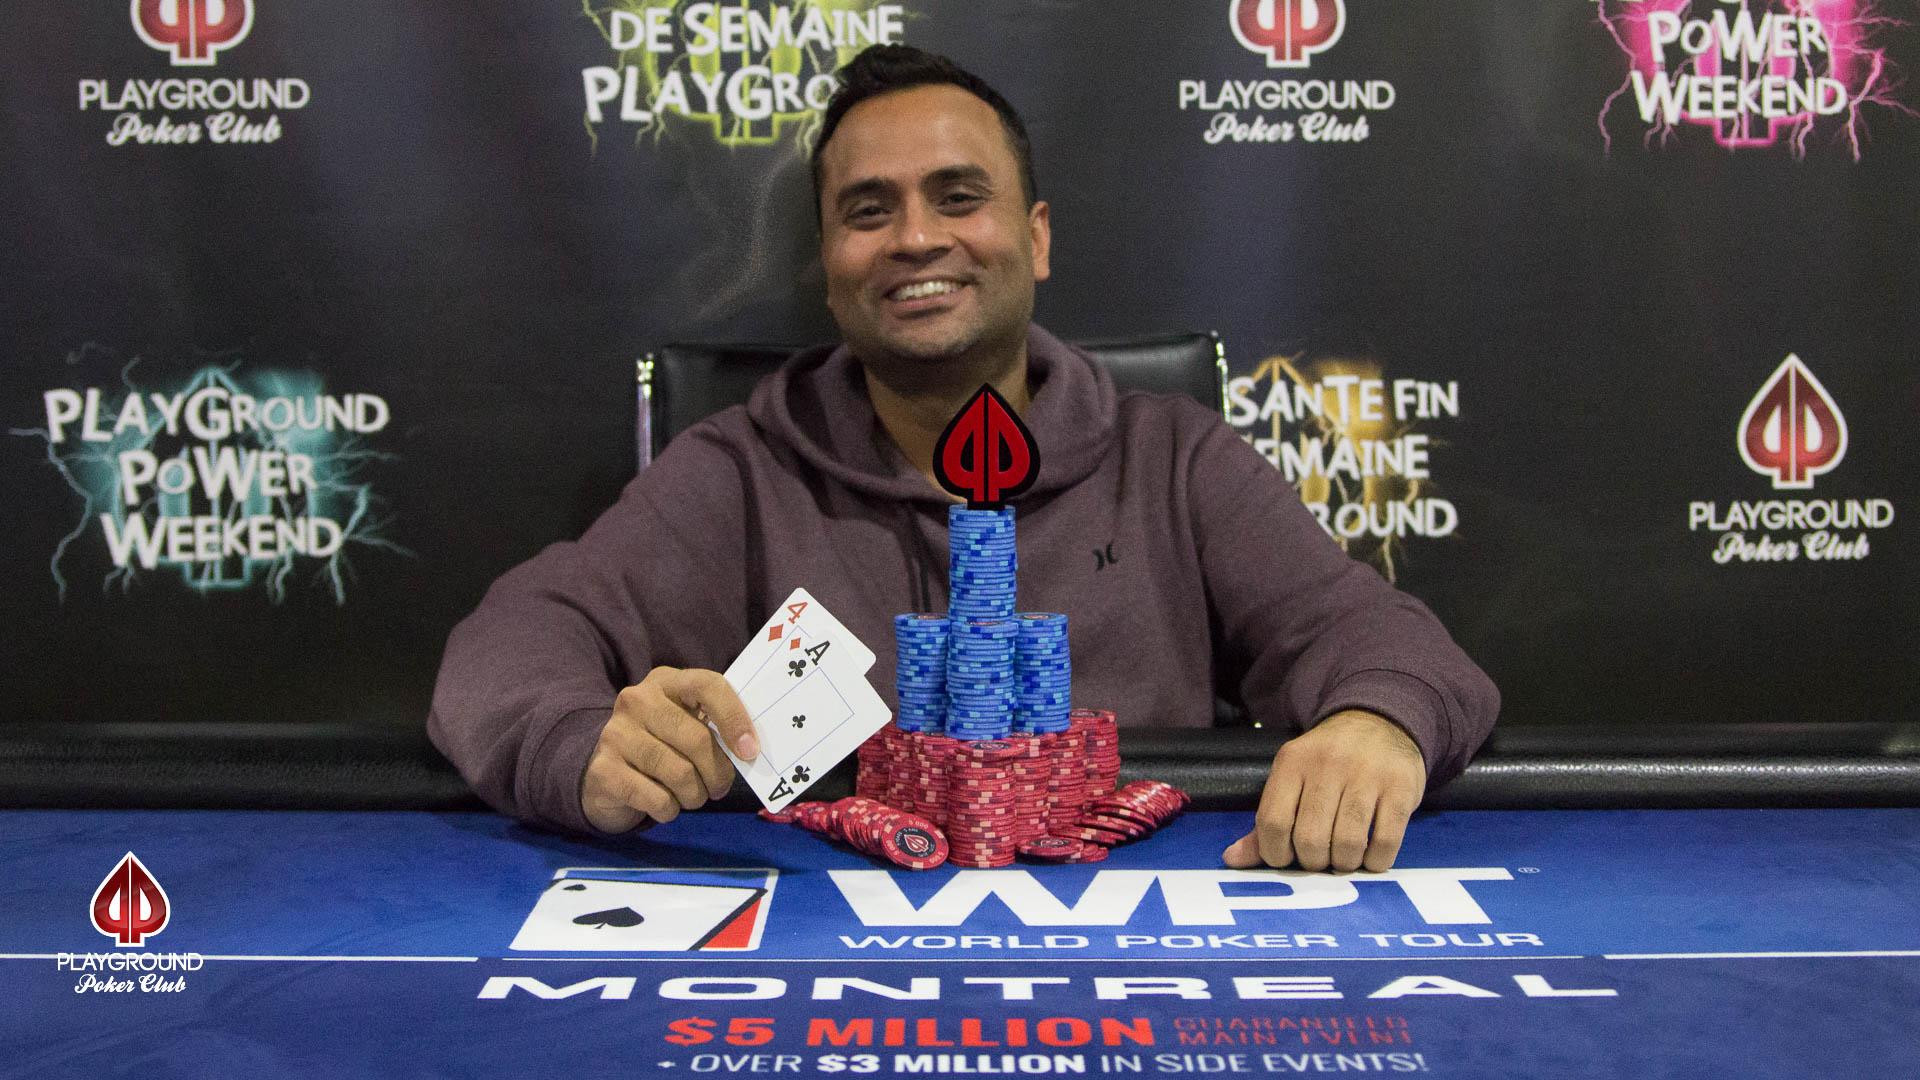 Charan Malhotra winner of Event #13 Bounty